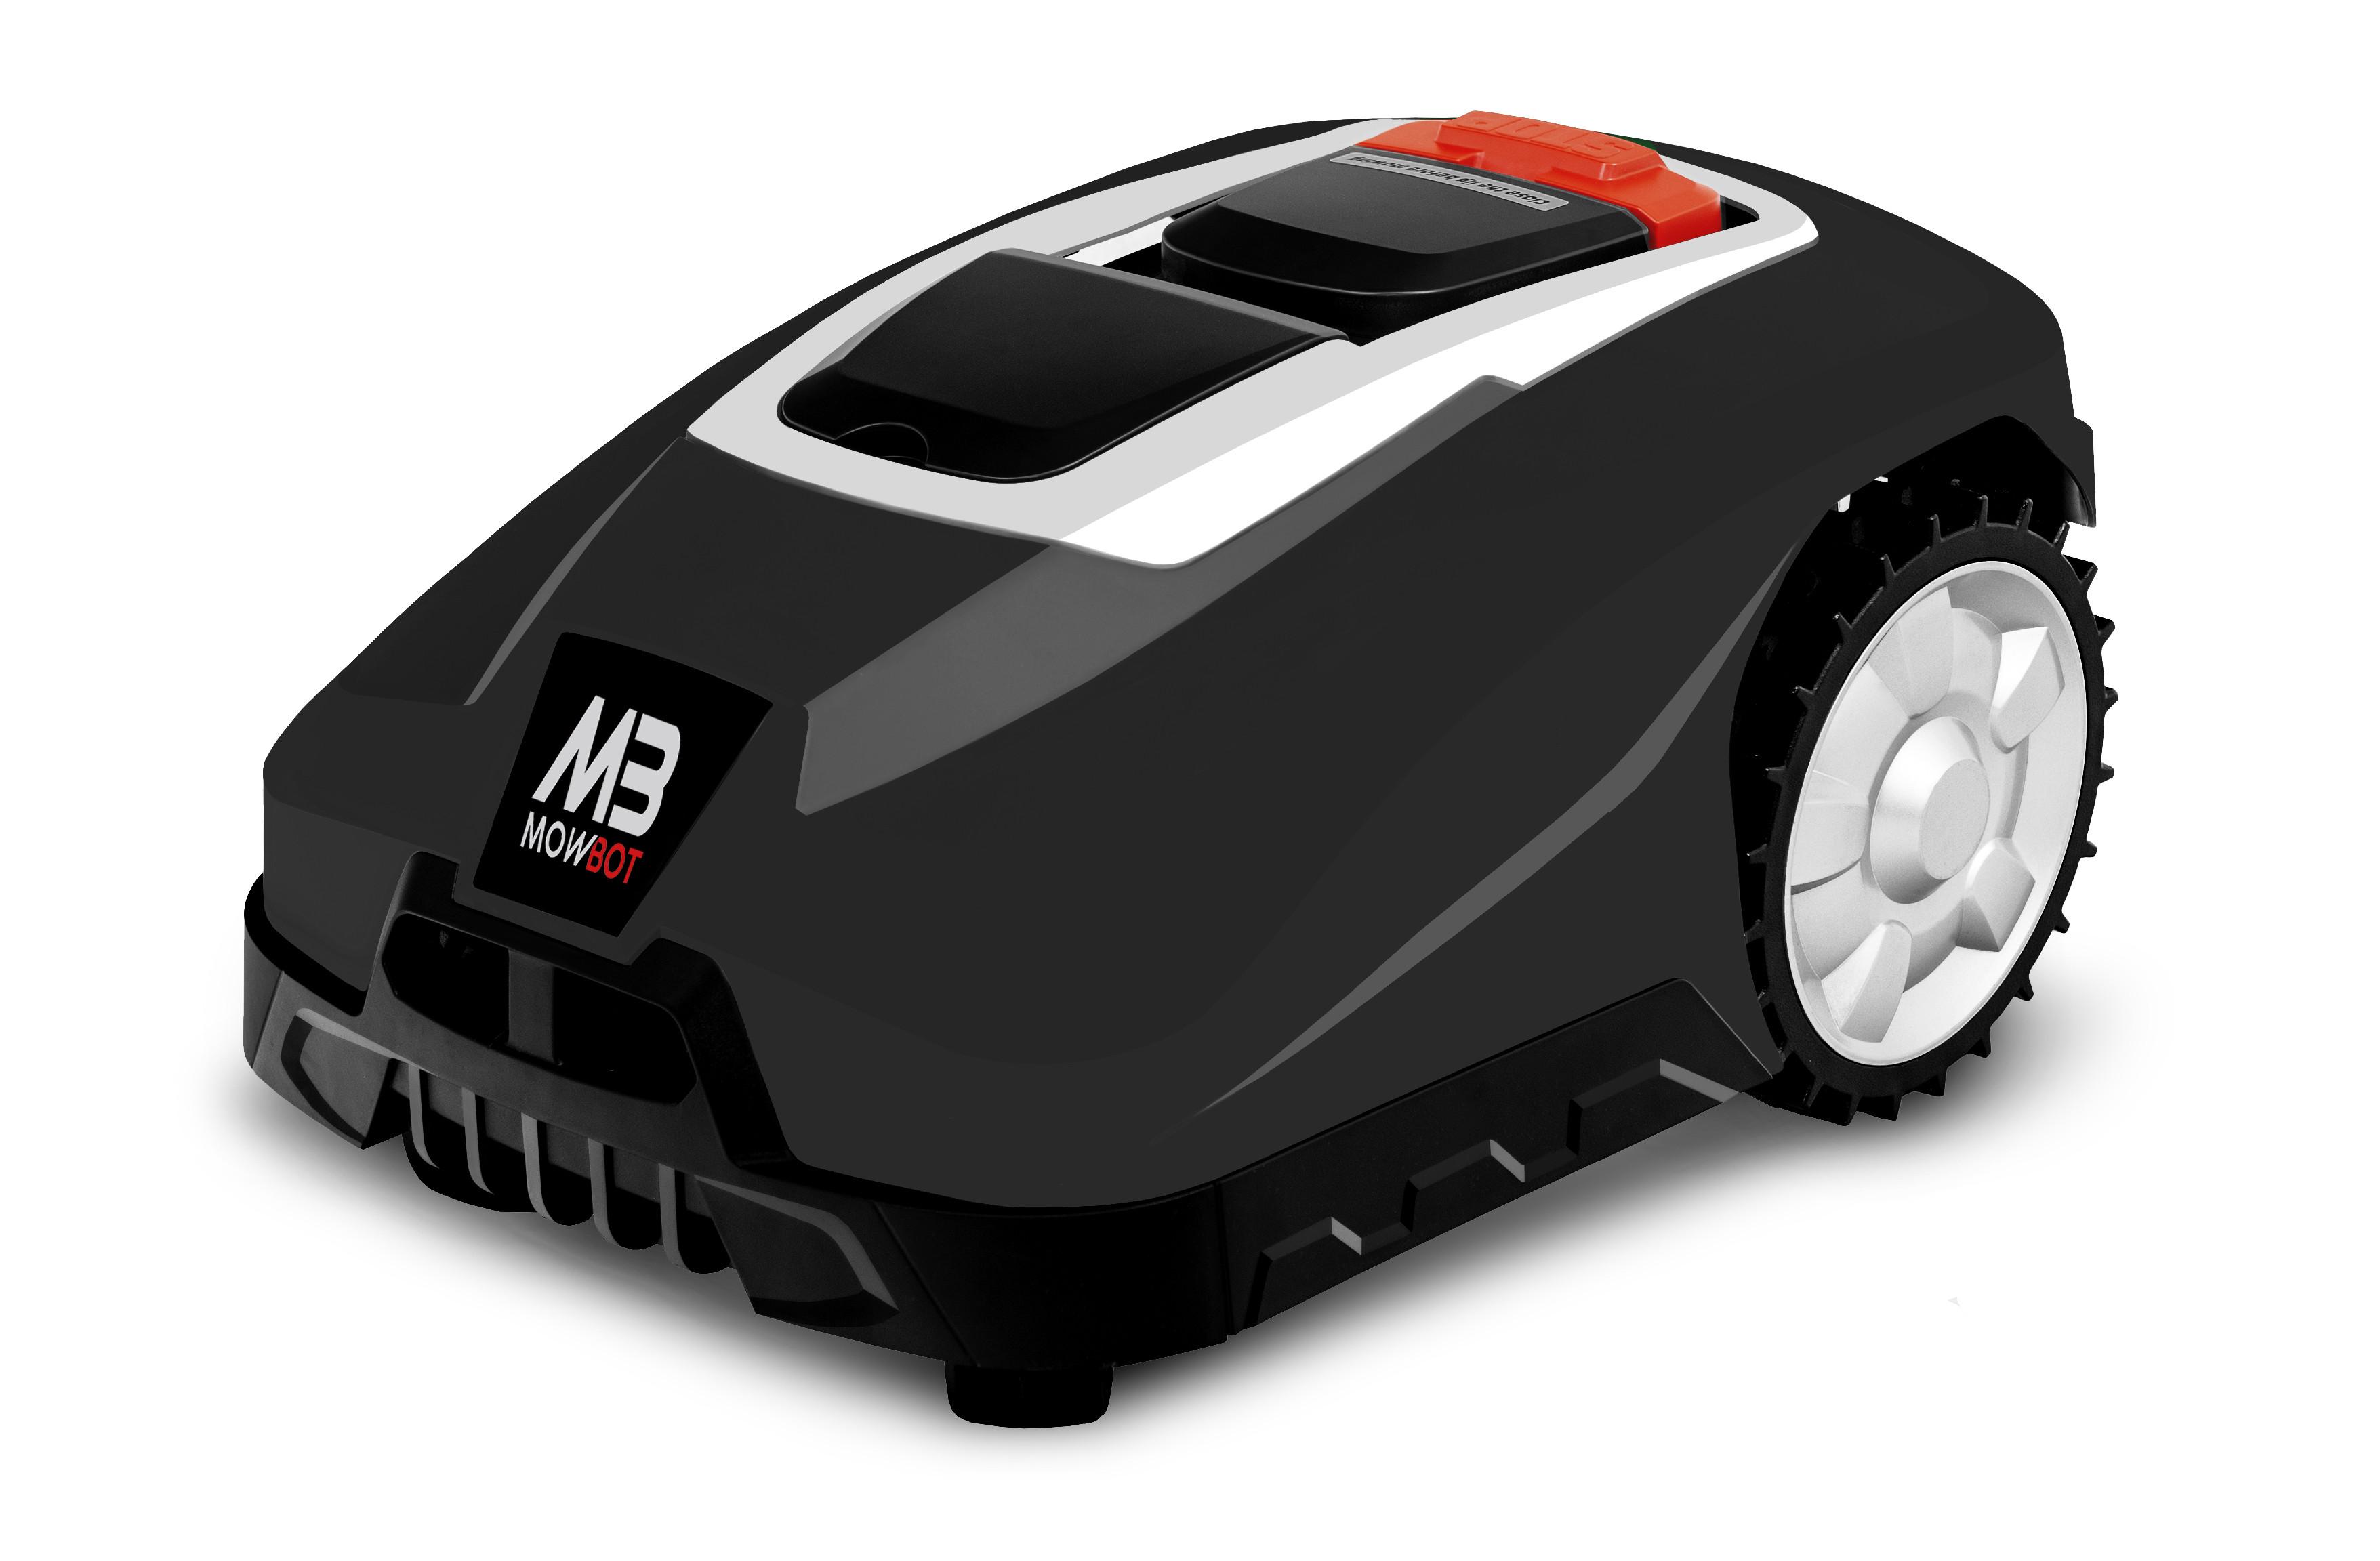 Mowbot 1200 Midnight Black 1200sq/m Robotic Mower